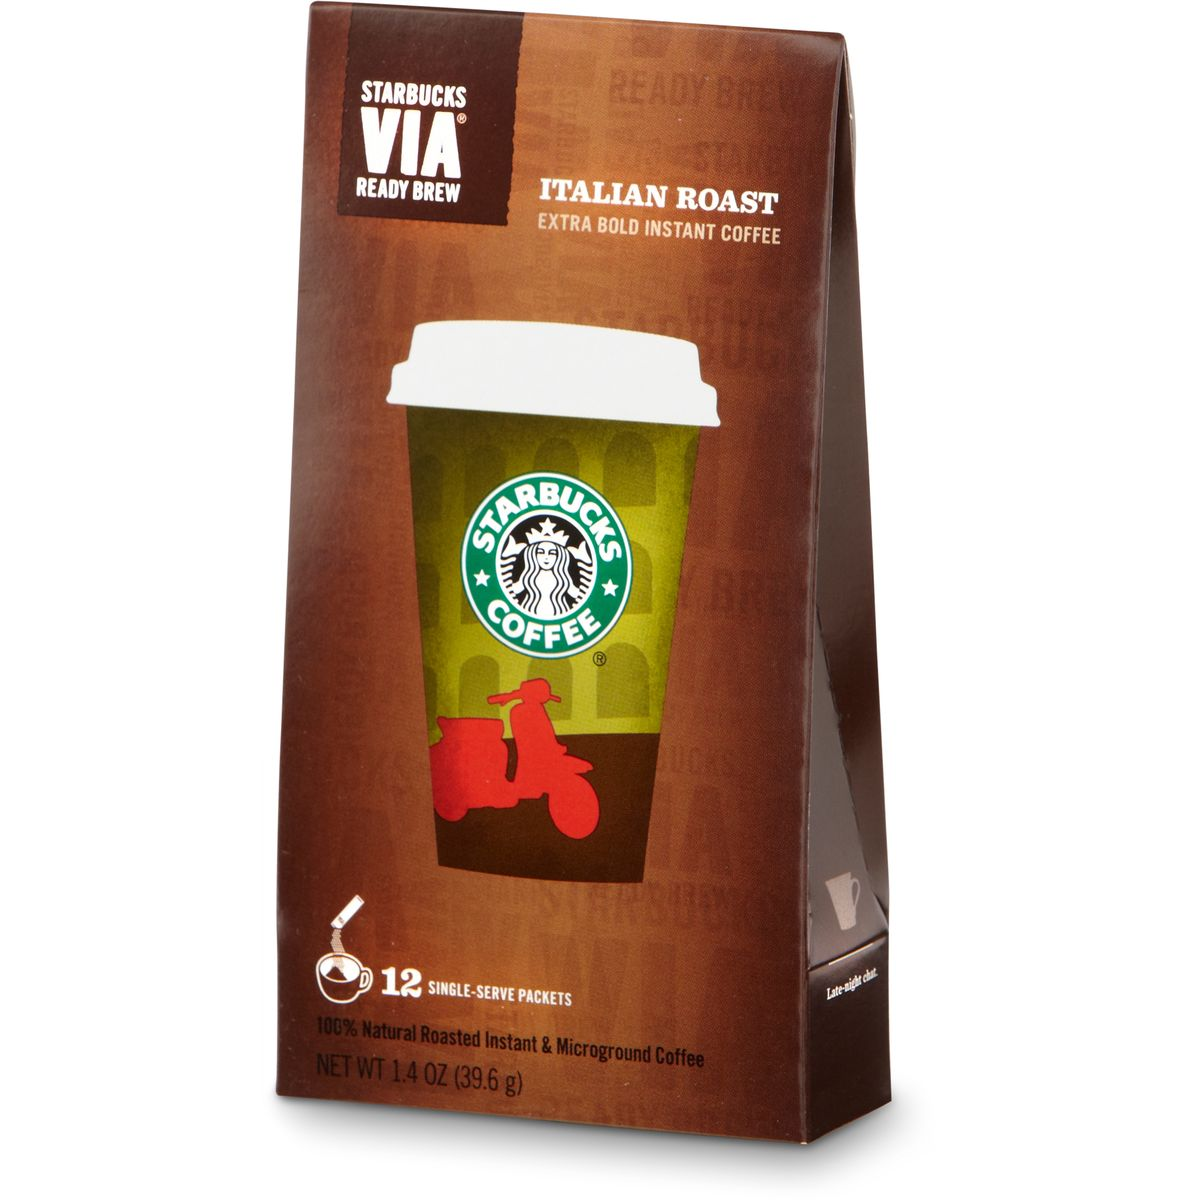 New Coupons: Starbucks, Pampers, Buitoni, plus more! - Money Saving Mom